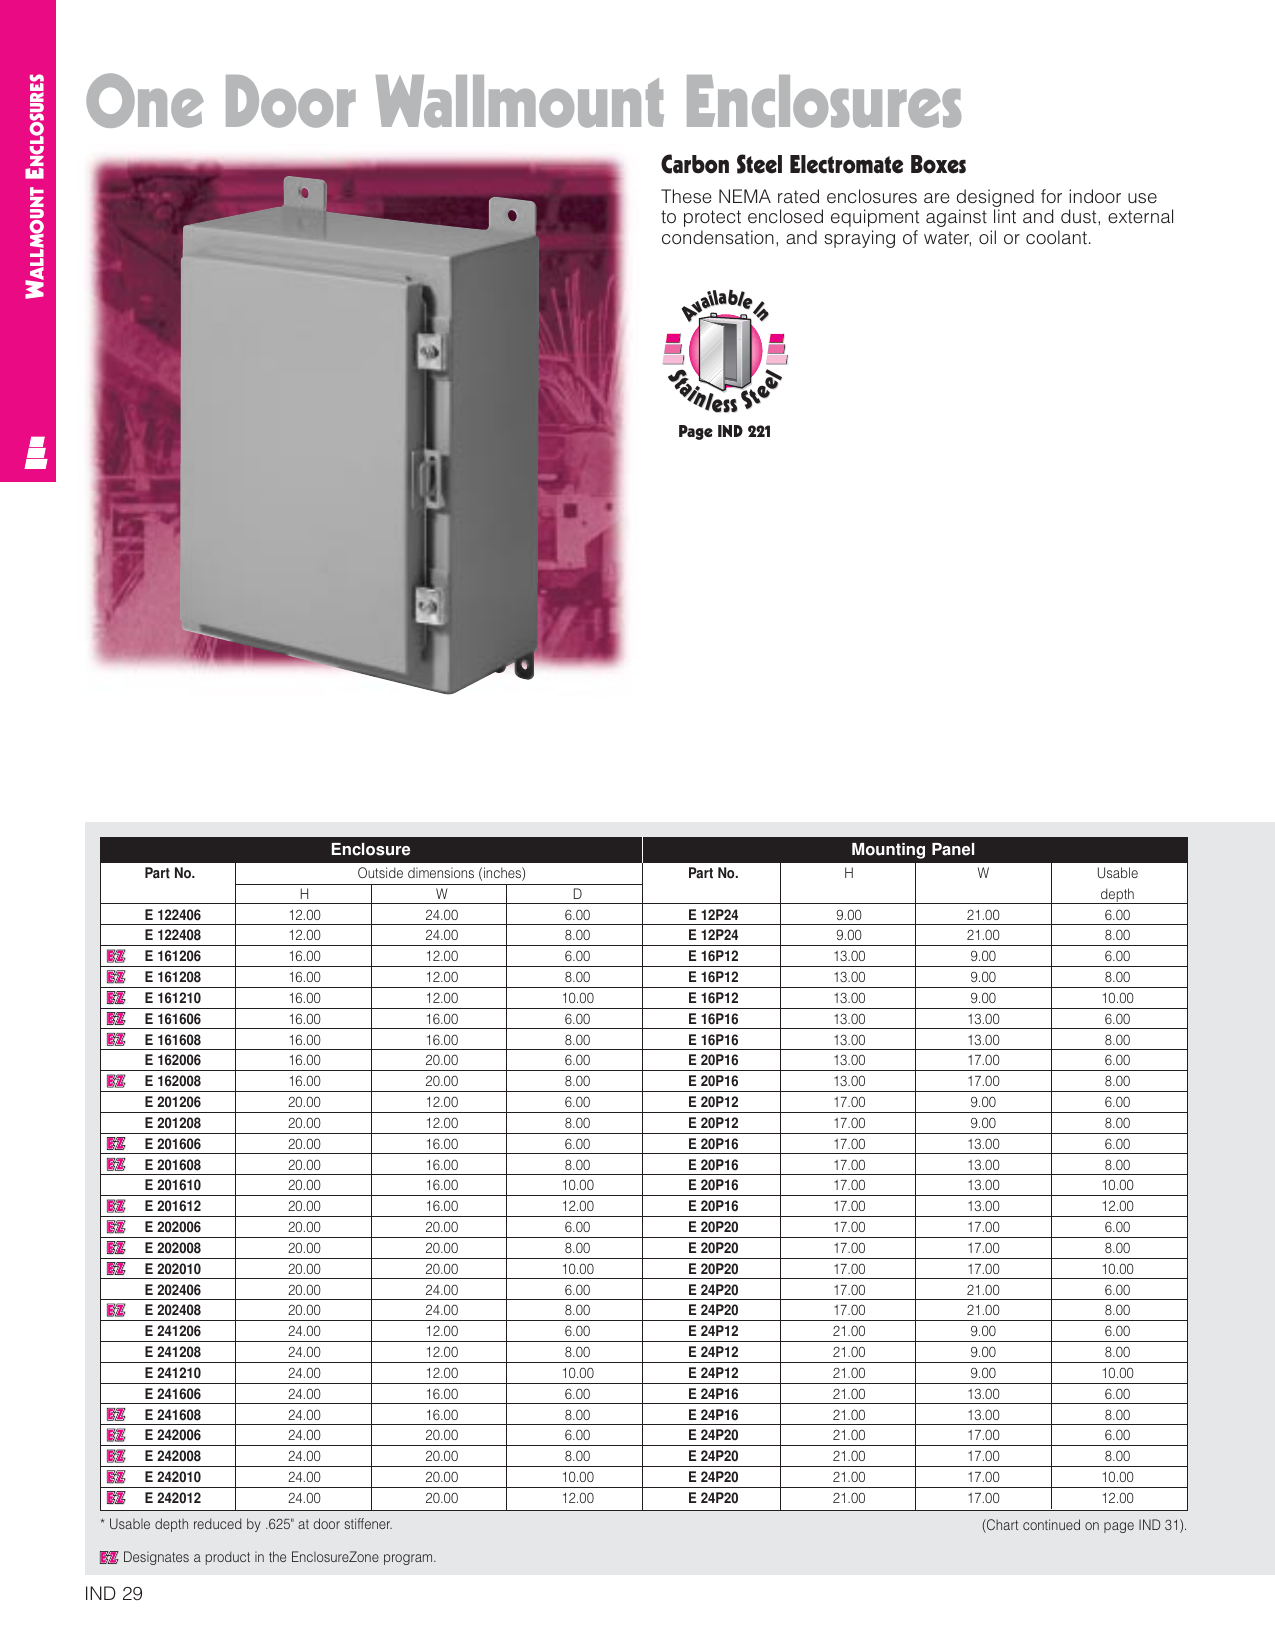 Electrical Enclosure Weatherproof 27x20x10 w//Back Plate Hinge Door Cabinet Steel